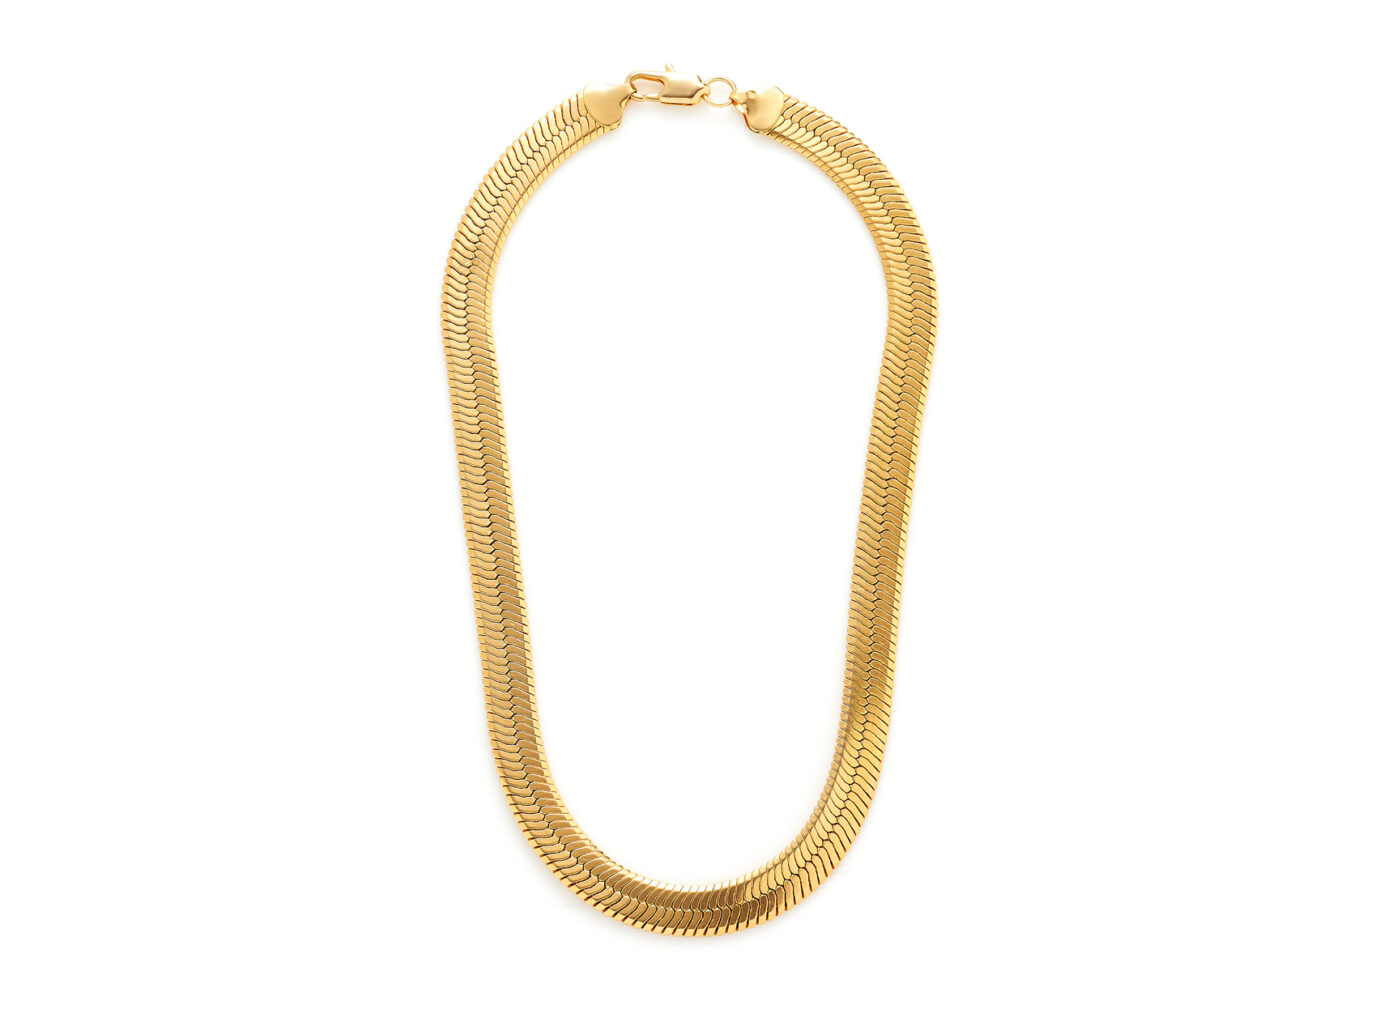 Gold Necklace: Fallon Gold-Tone Brass Collar Necklace